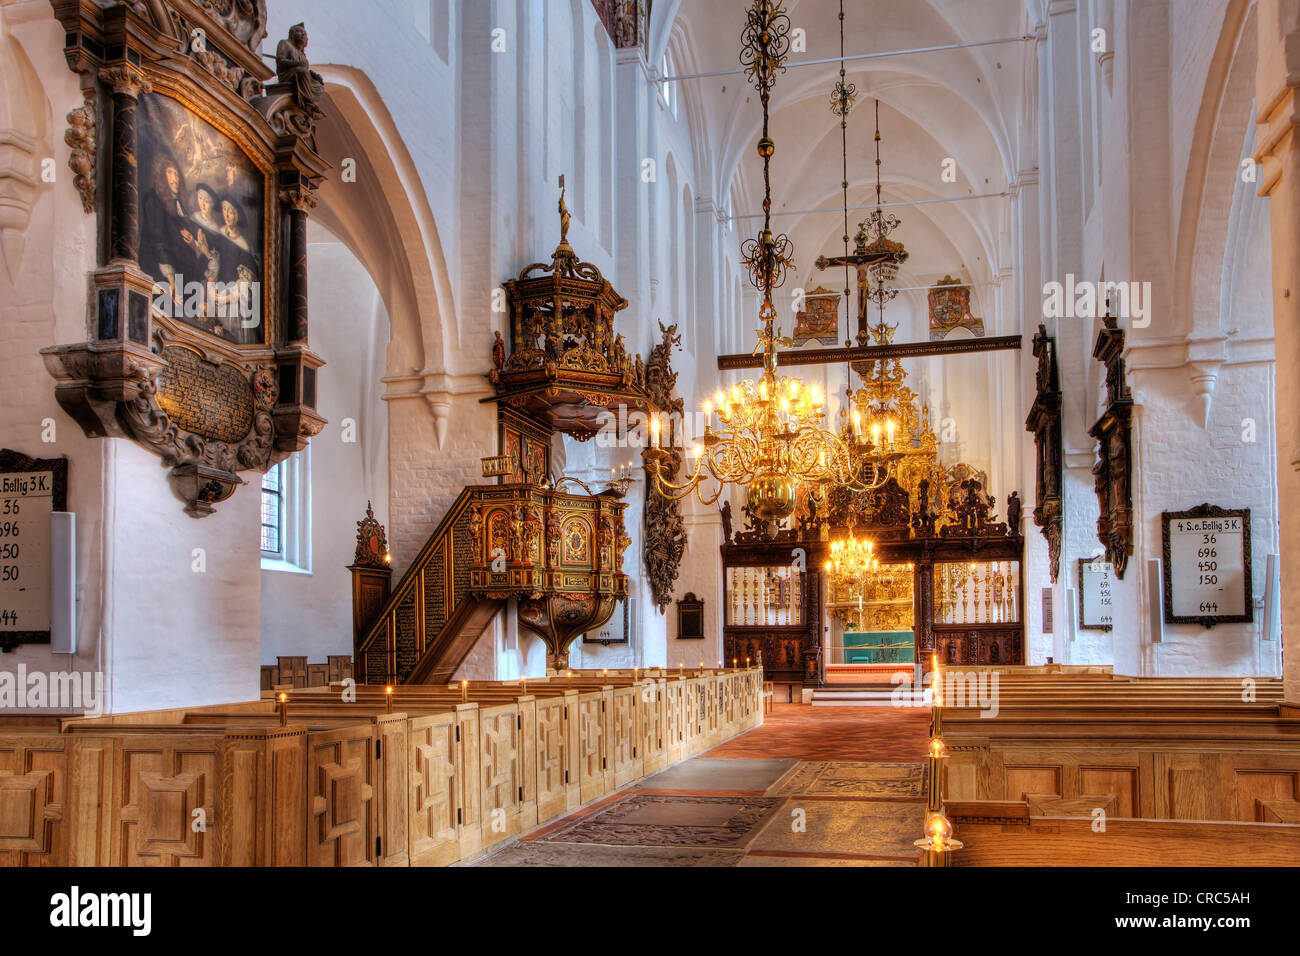 Sct. Olai Domkirke cathedral, interior, Helsingør, Elsinore, Denmark, Europe - Stock Image